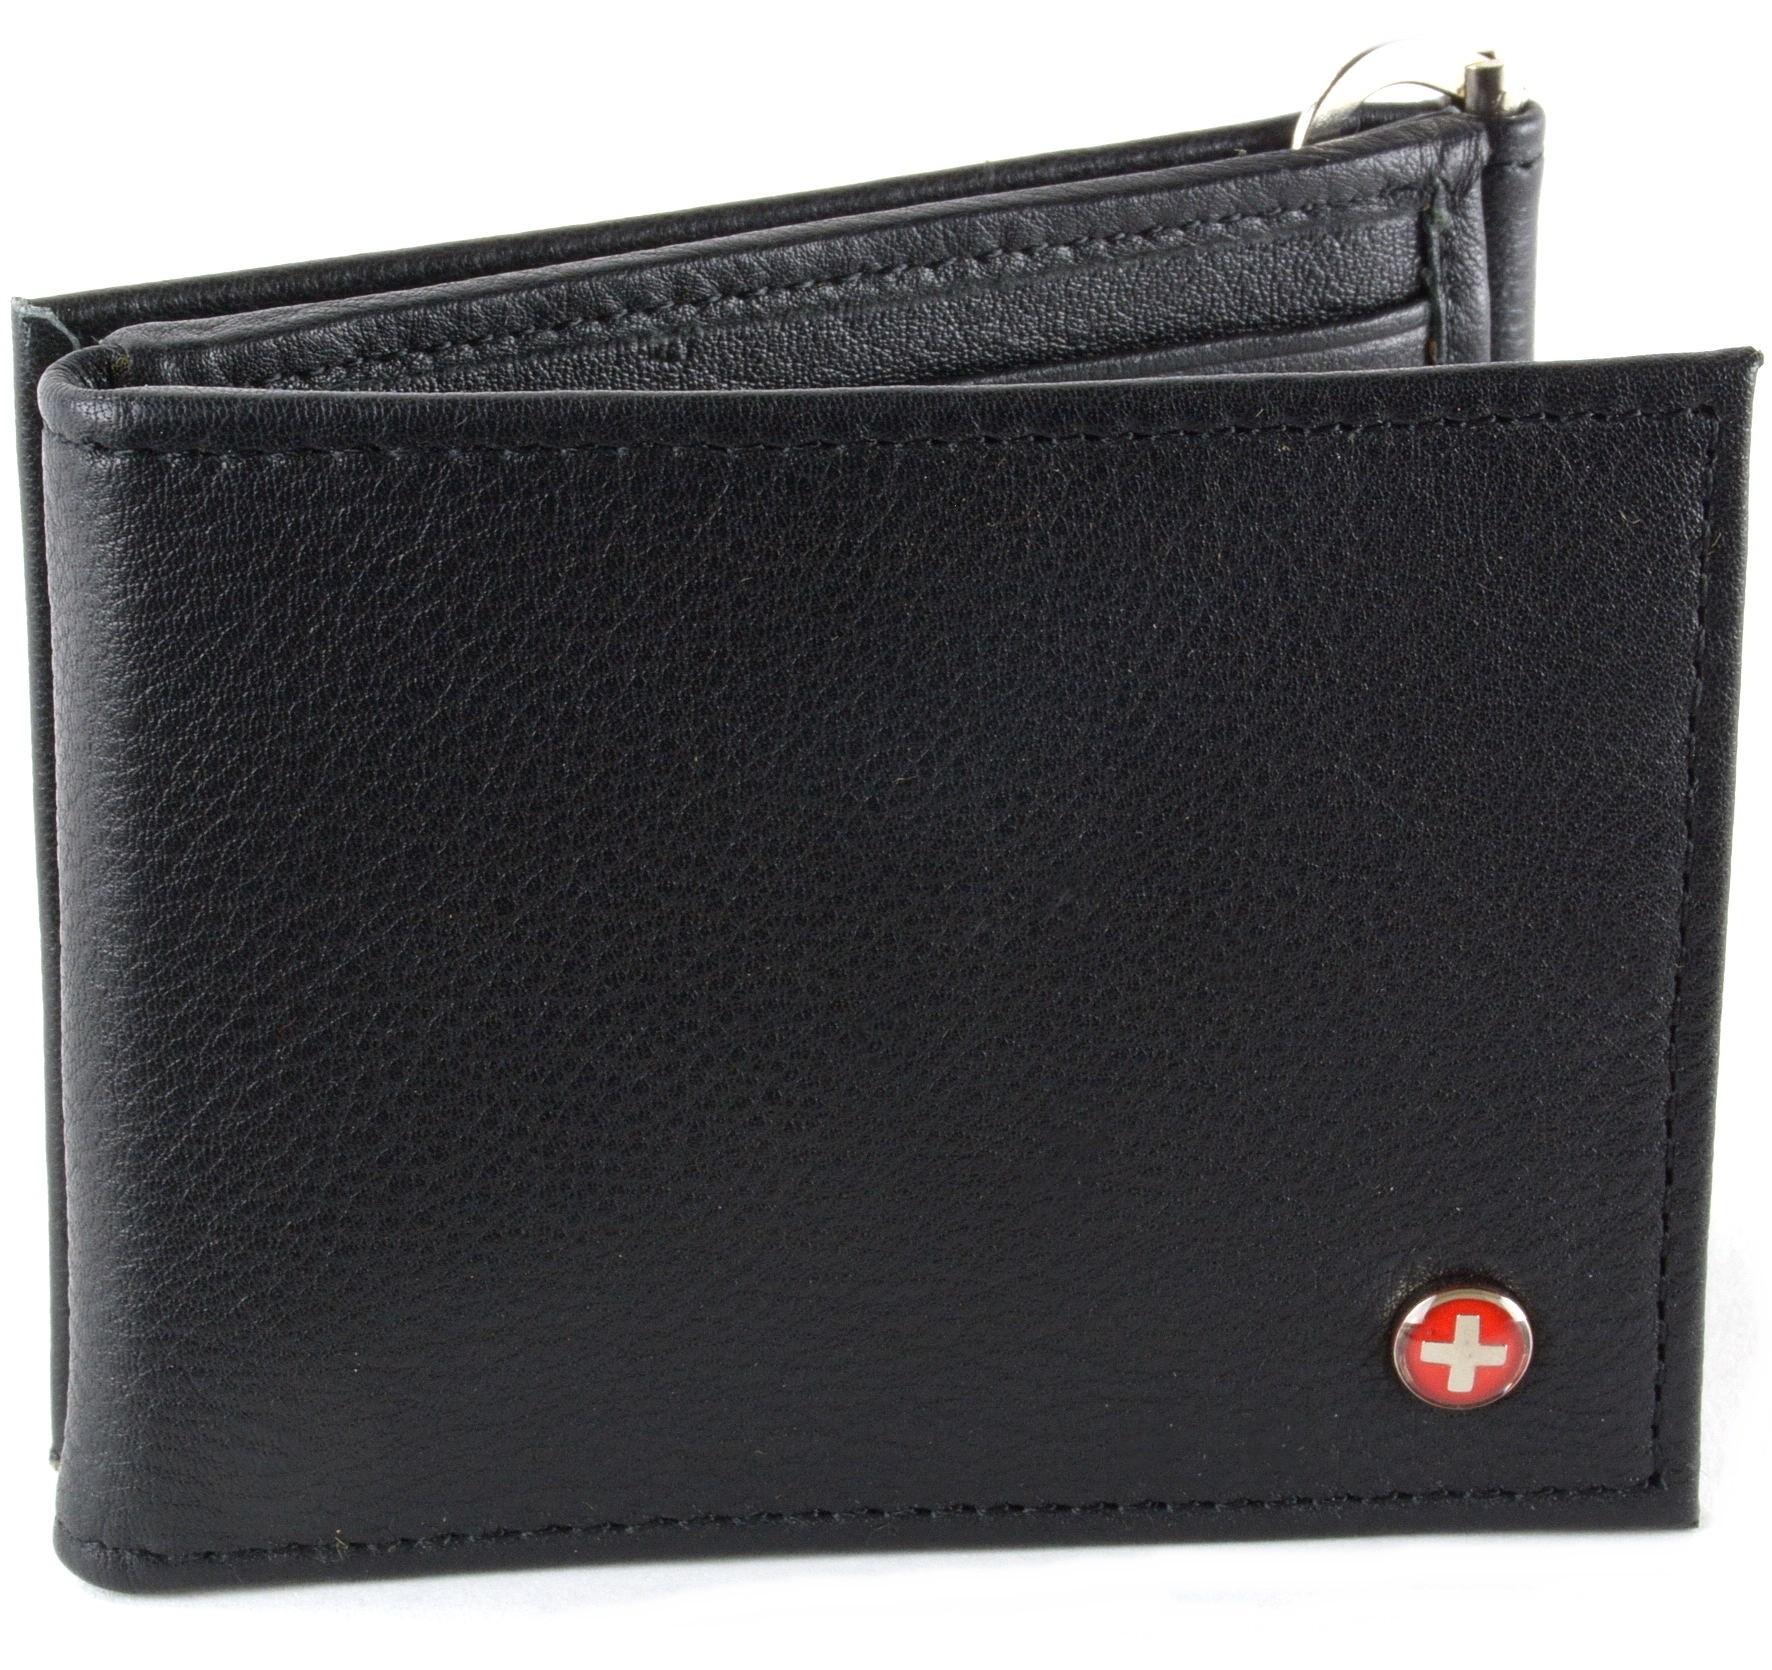 Mens Leather Wallet Spring Money Clip Z Shape Trifold Bifold 11 Card Slots 2 Ids Ebay